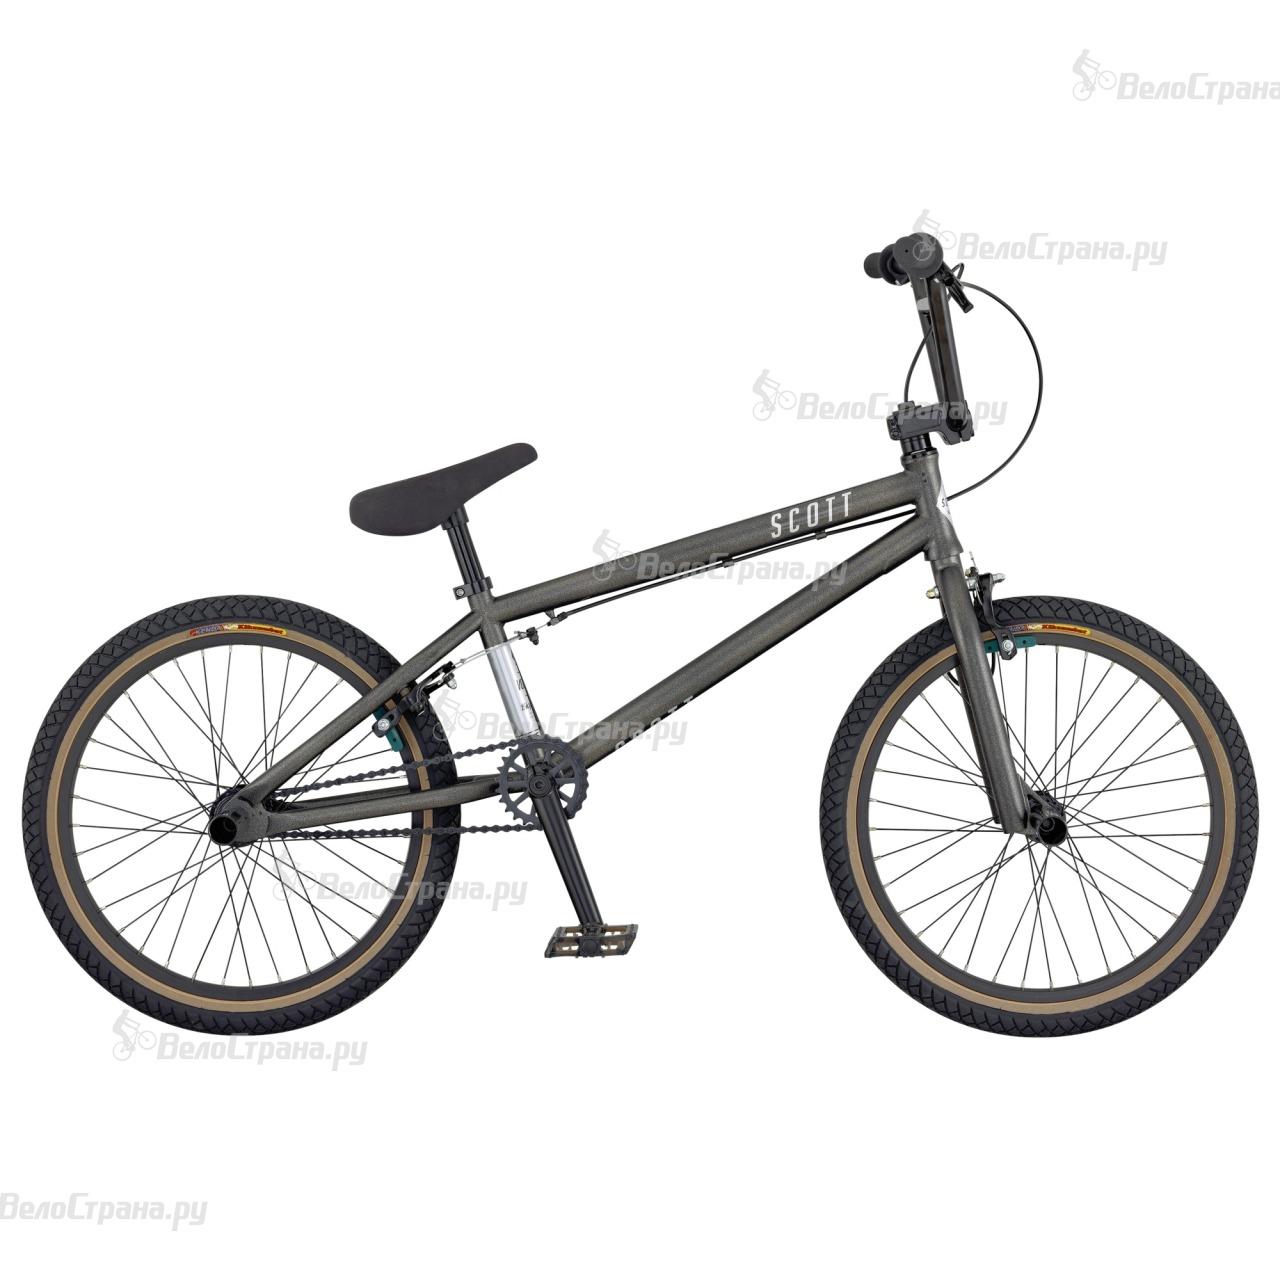 Велосипед Scott Volt-X 10 (2017)